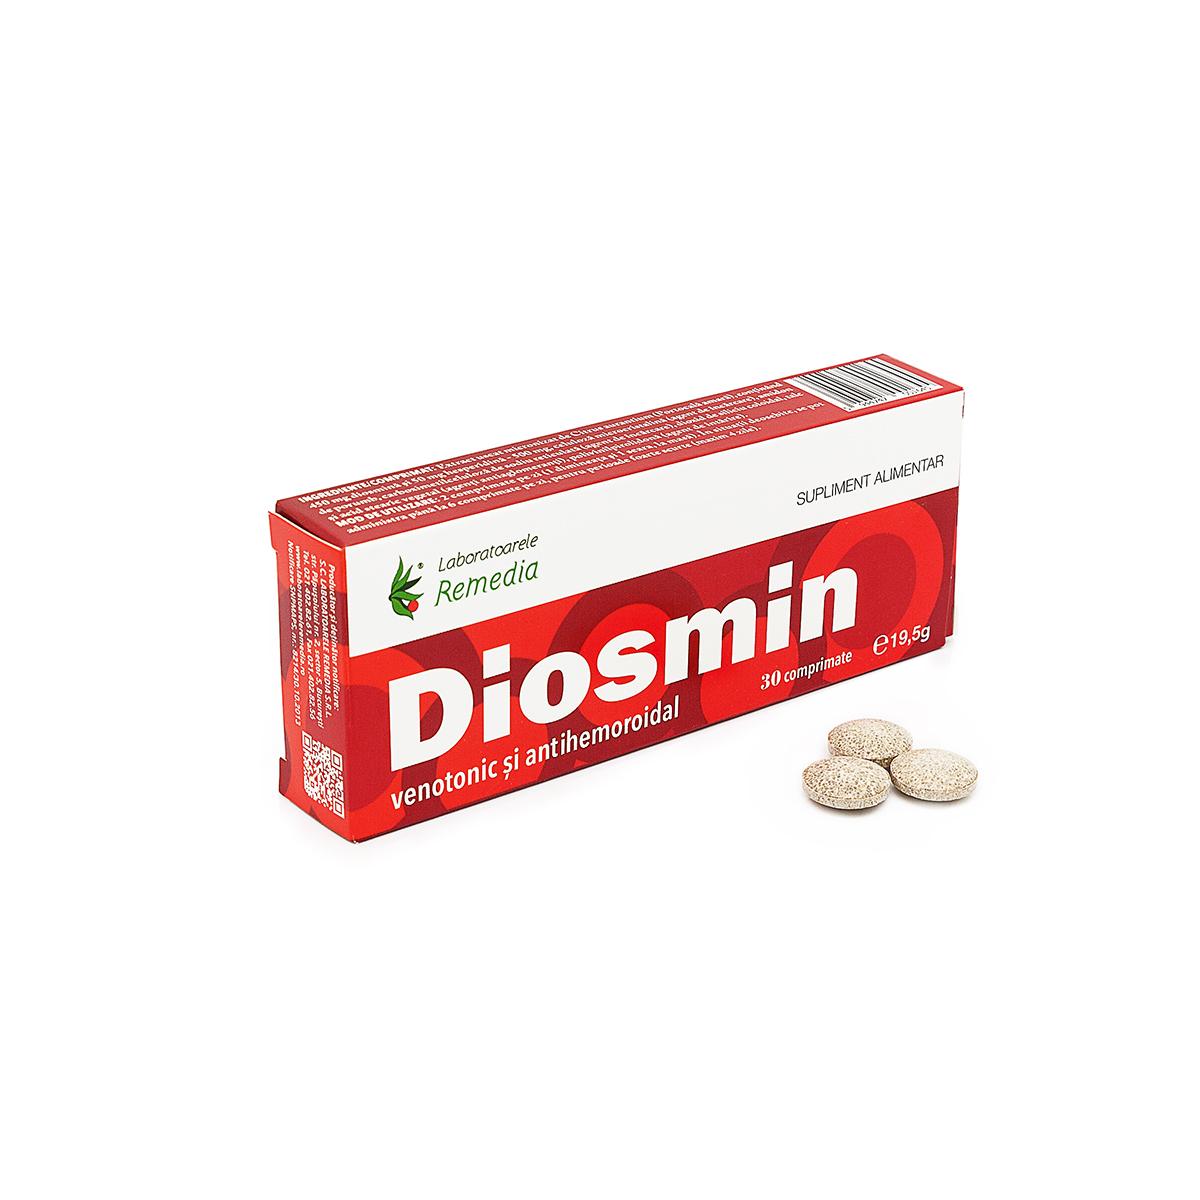 Diosmin extract standardizat de citrus aurantium, 30 comprimate, Remedia